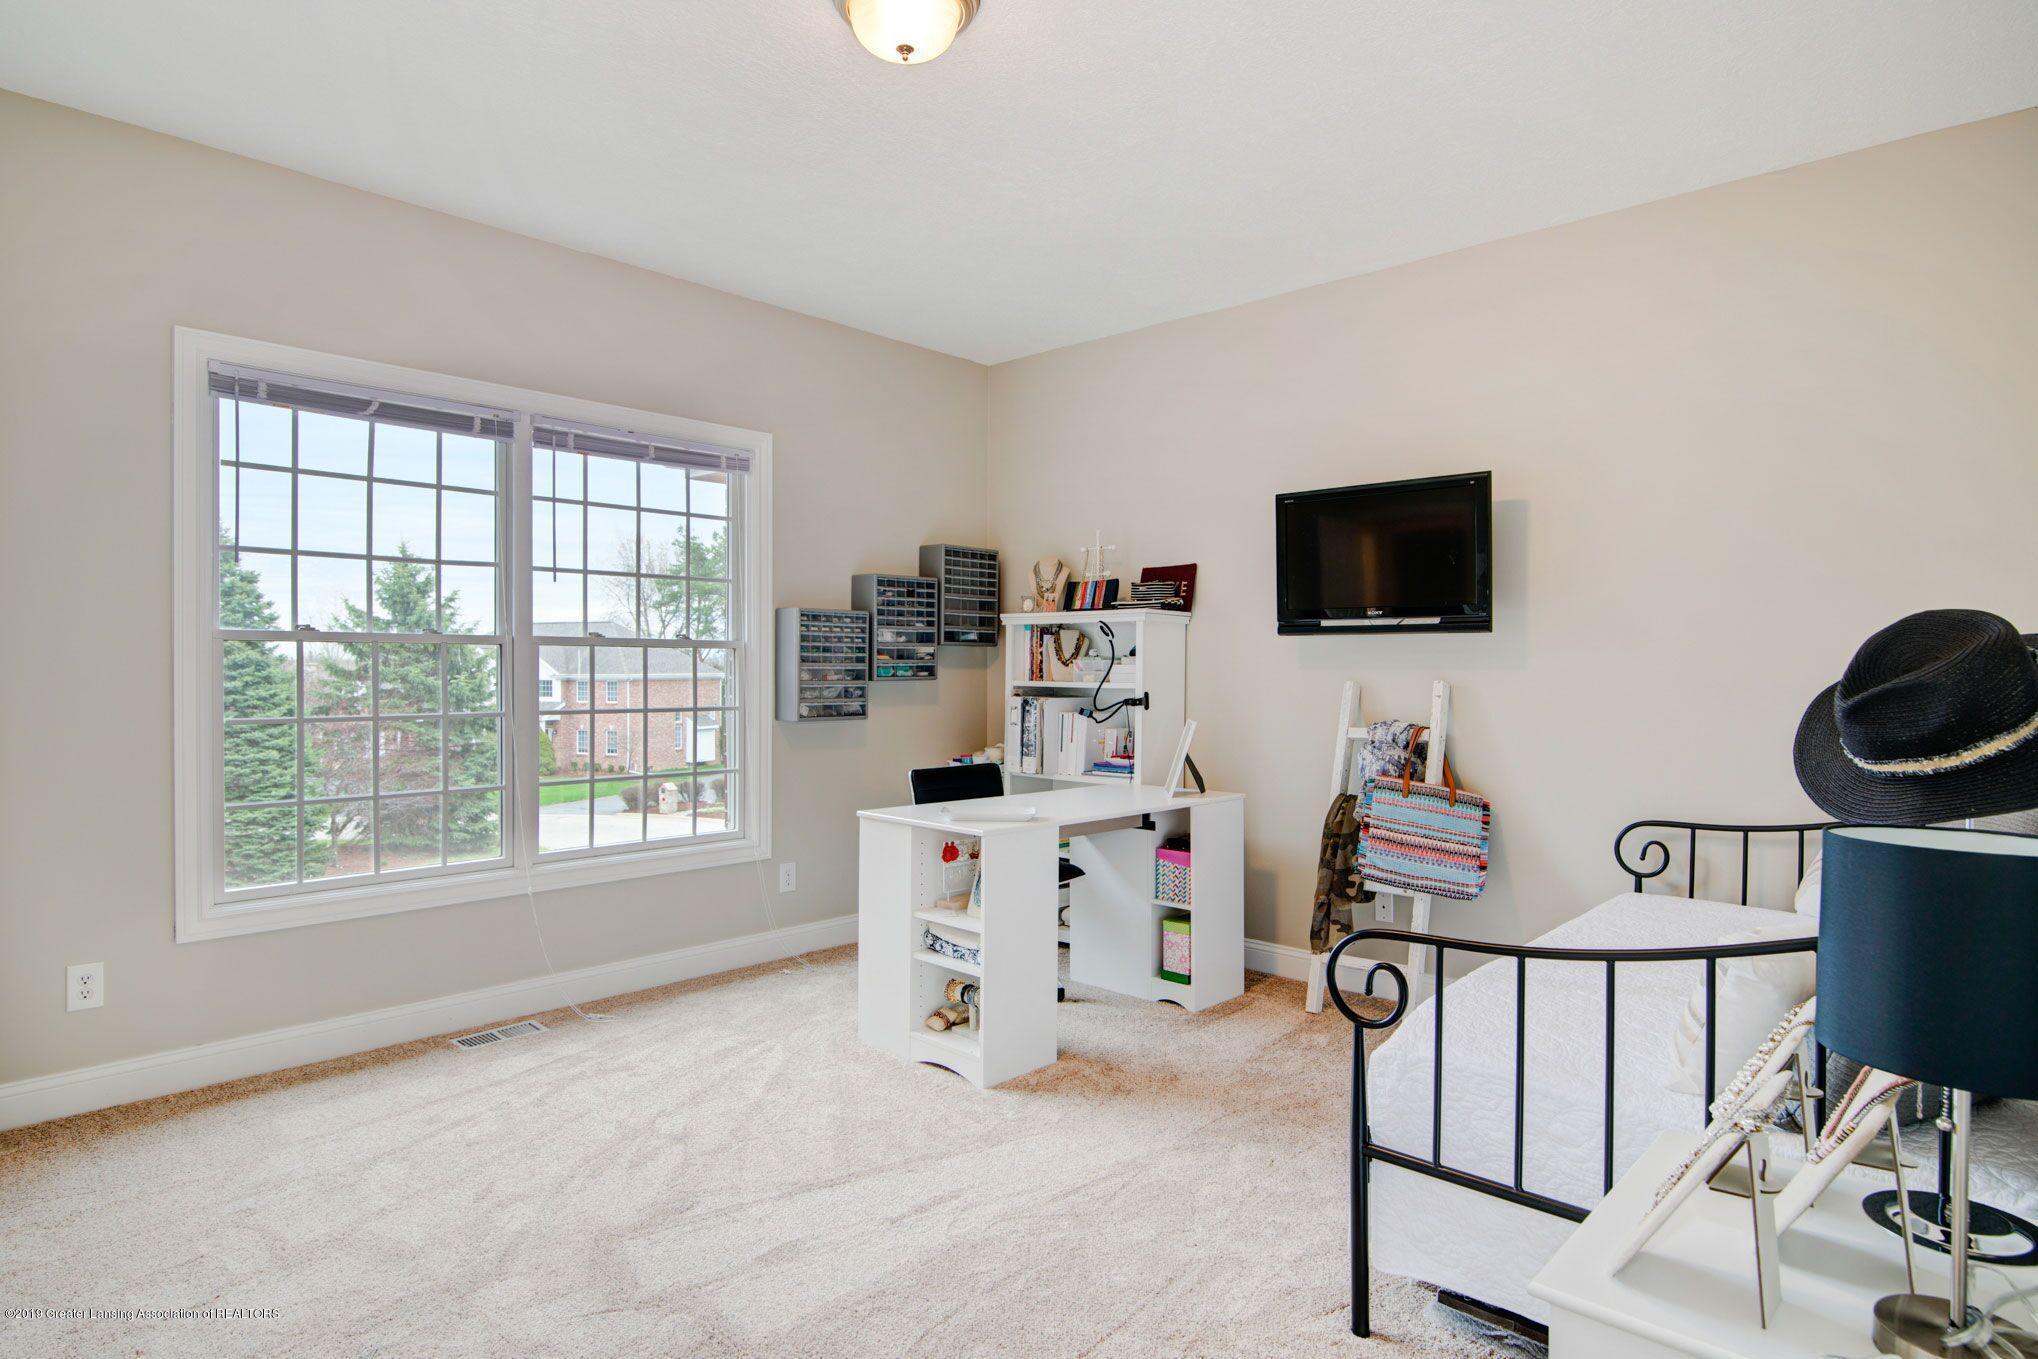 6389 Ridgepond Dr - Bedroom 1 2 - 24